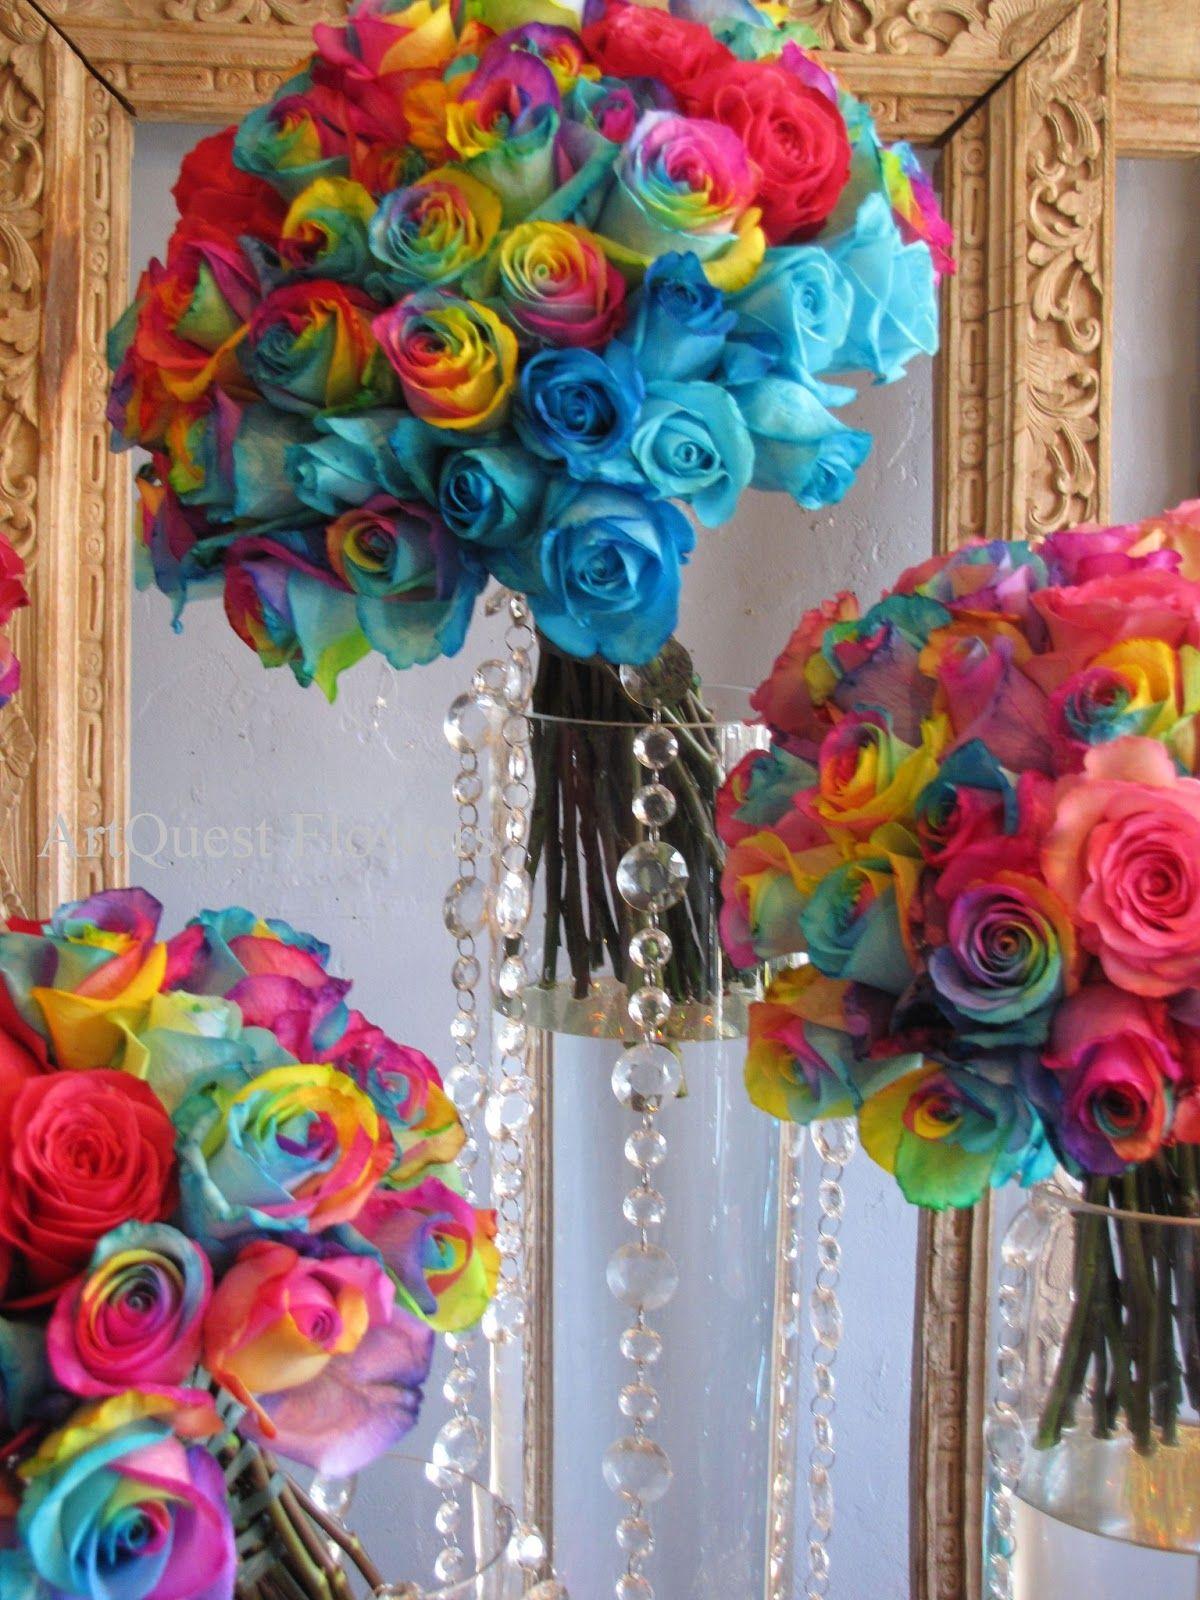 San Diego, Coronado, Del Mar, Wedding Florist and Planner | Indian Wedding Planner and Florist: Rainbow Roses #rainbowroses